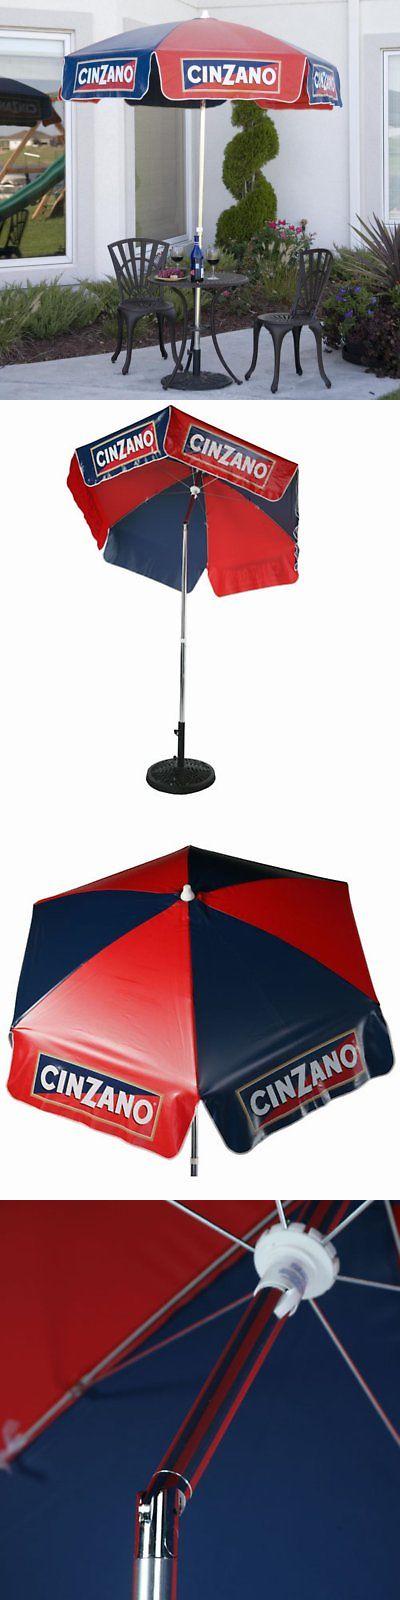 Umbrellas 180998: Destinationgear 6 Ft. Aluminum Cinzano Patio Umbrella  U003e  BUY IT NOW